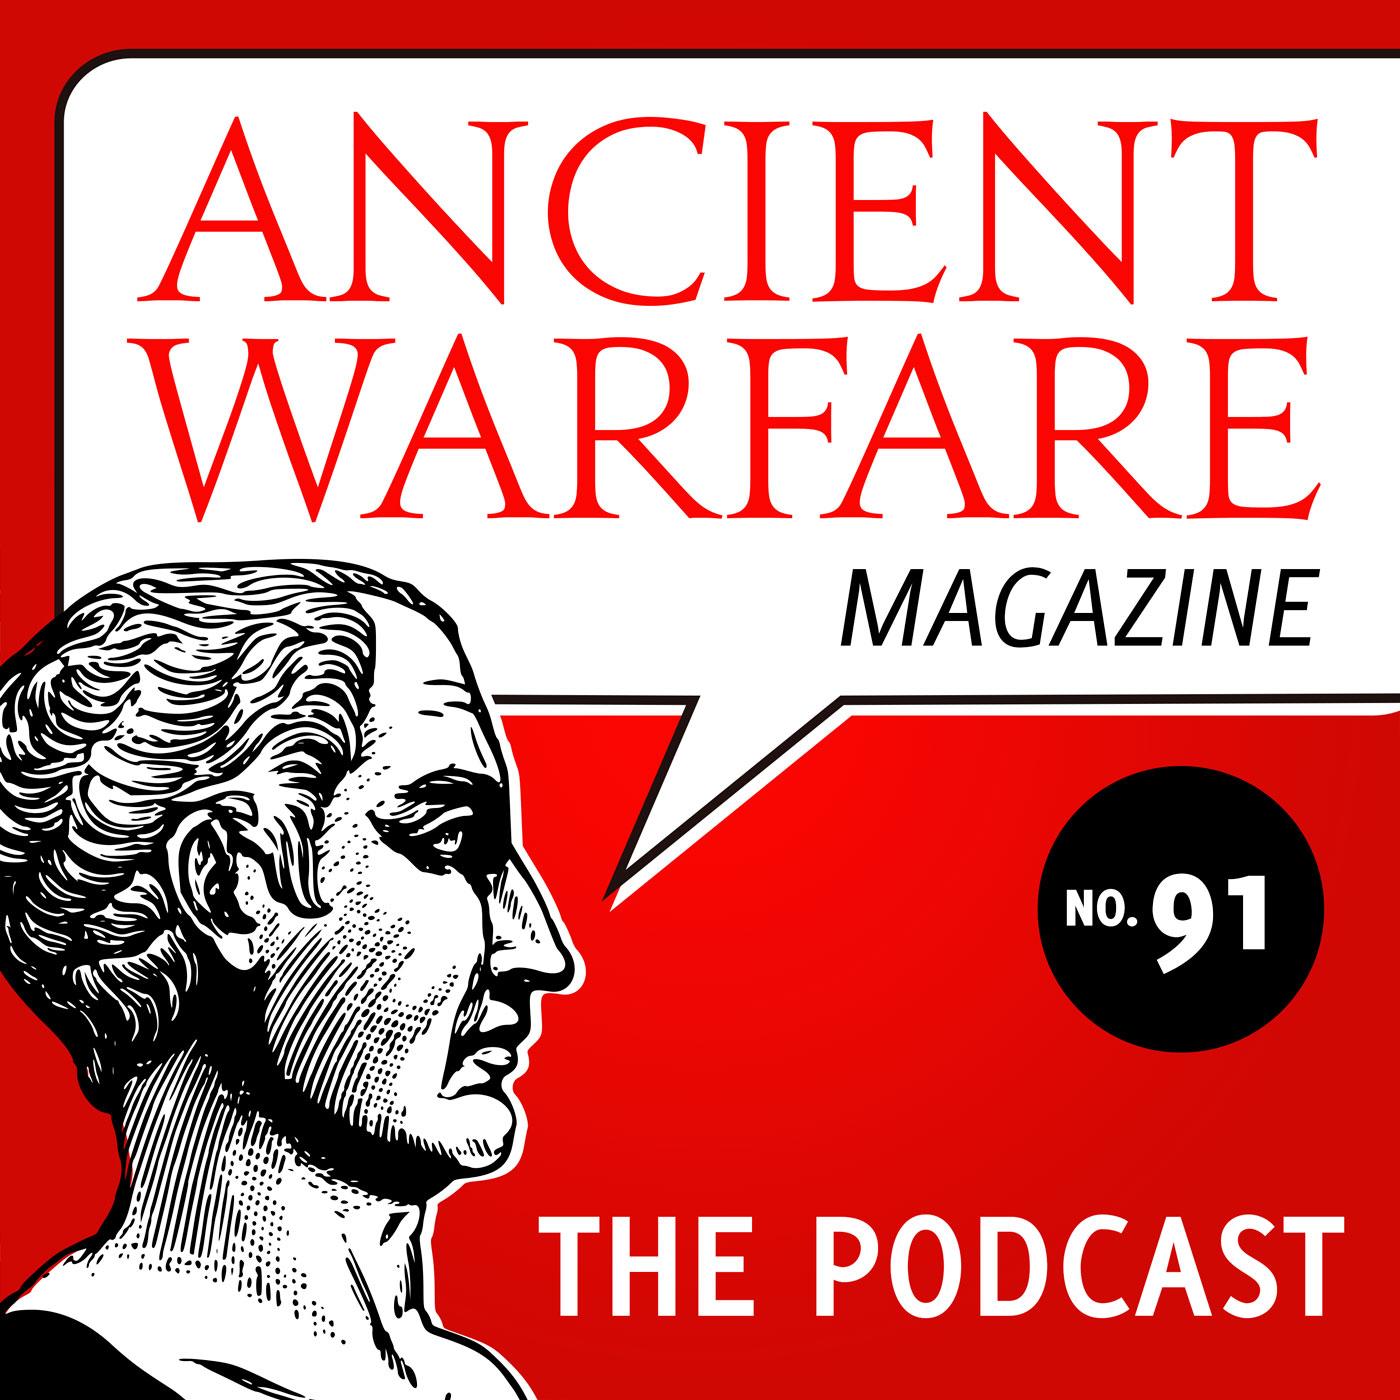 Ancient Warfare tropes